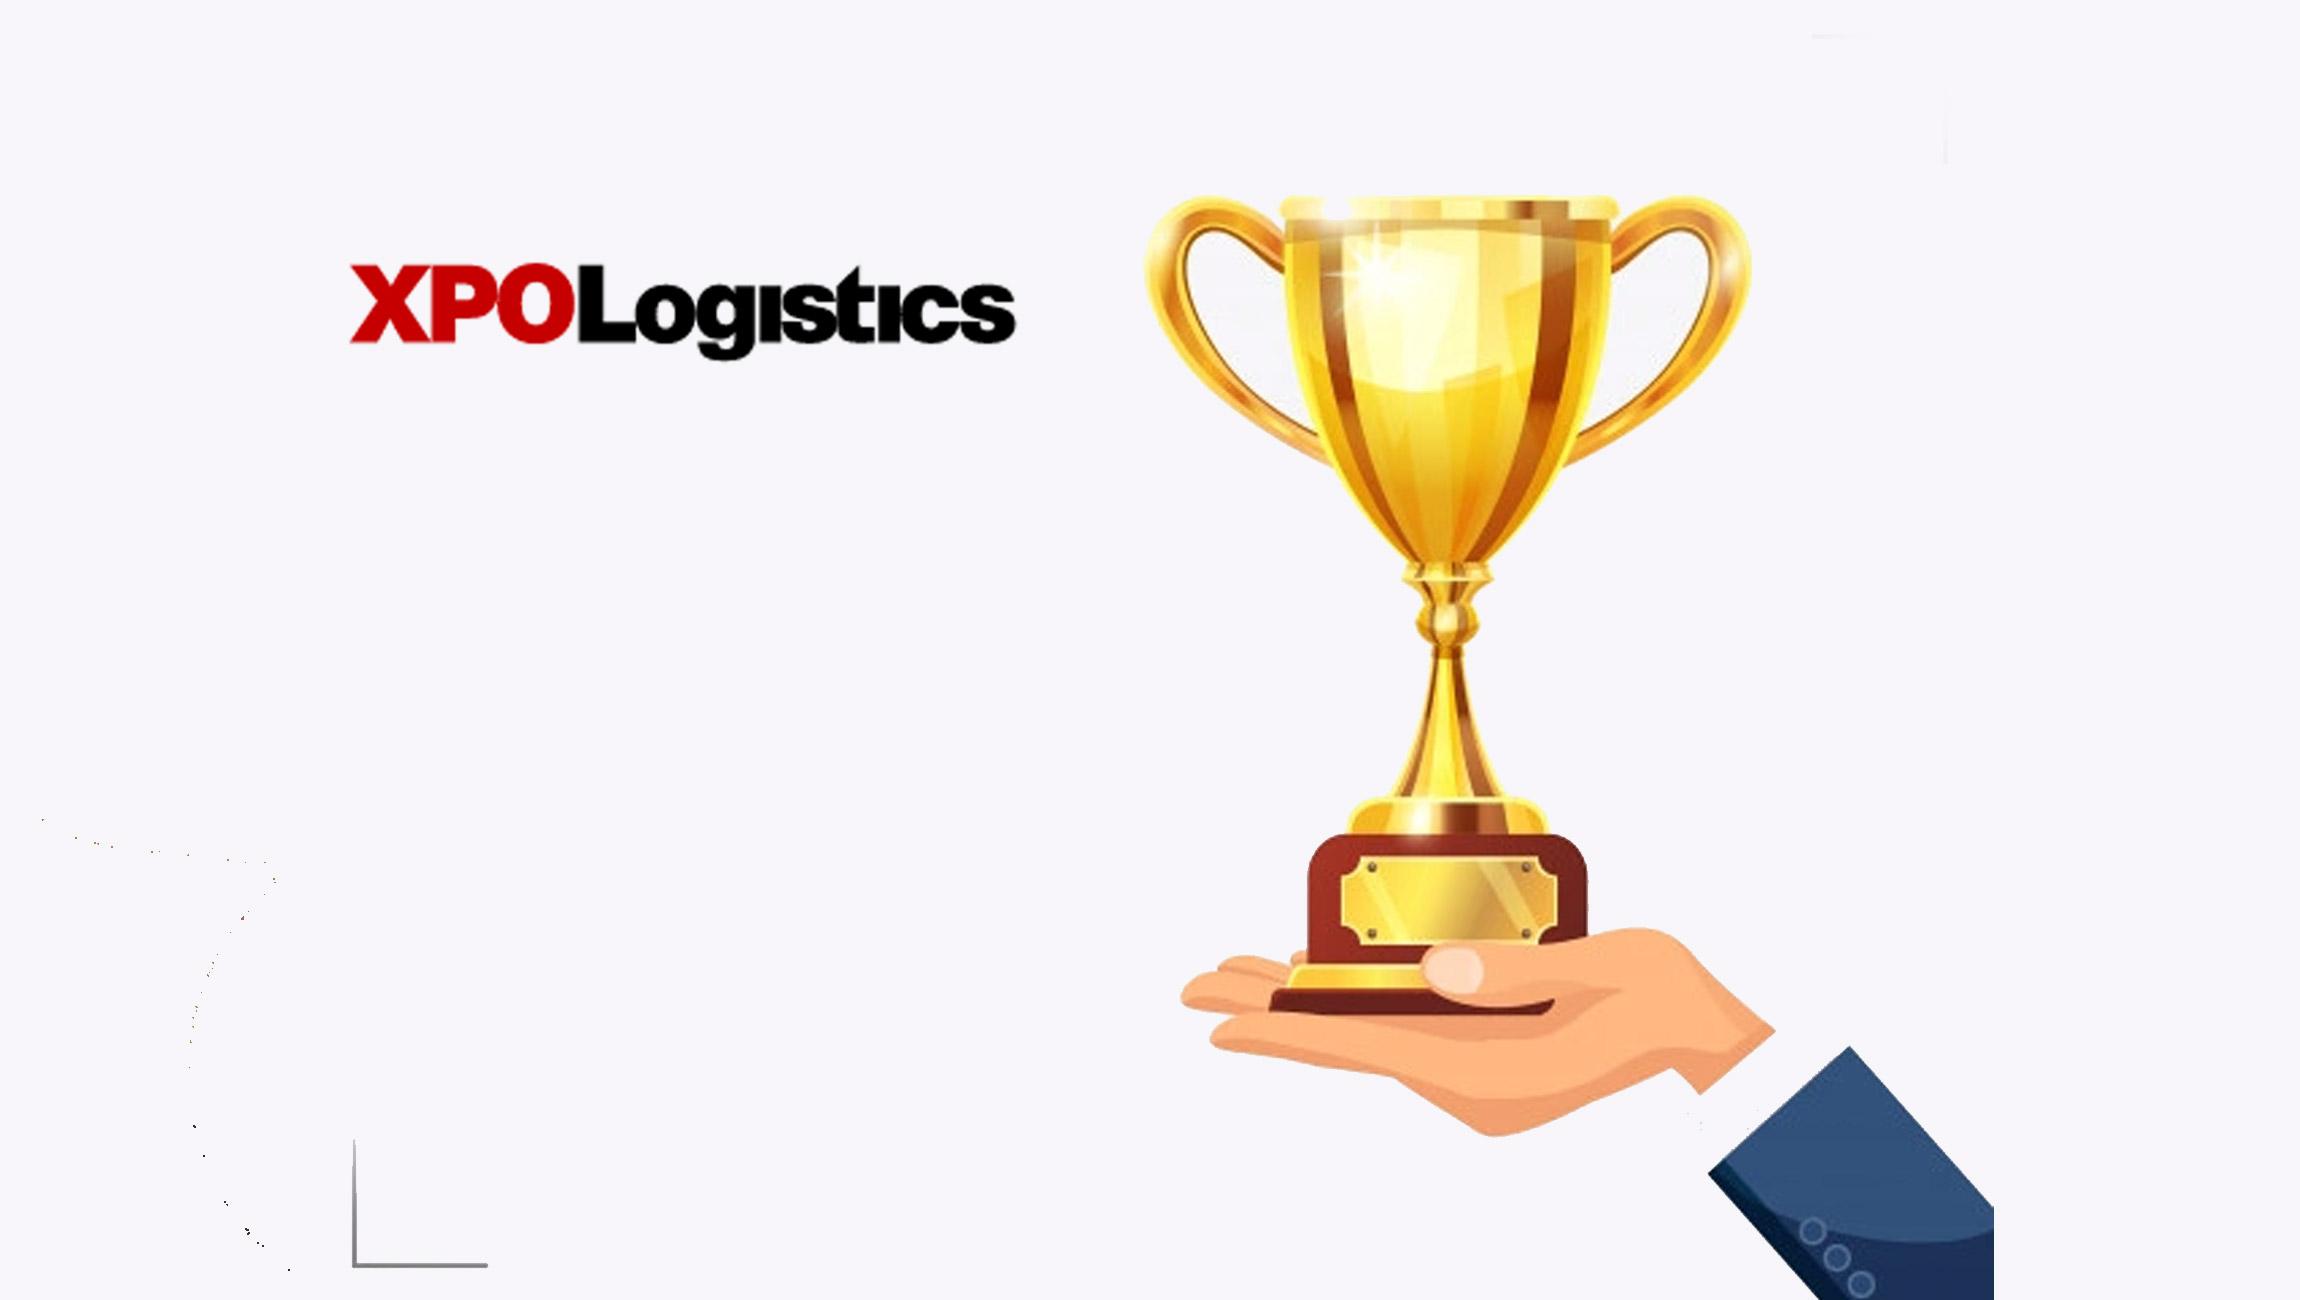 XPO Logistics Receives Intel Award for COVID-19 Response